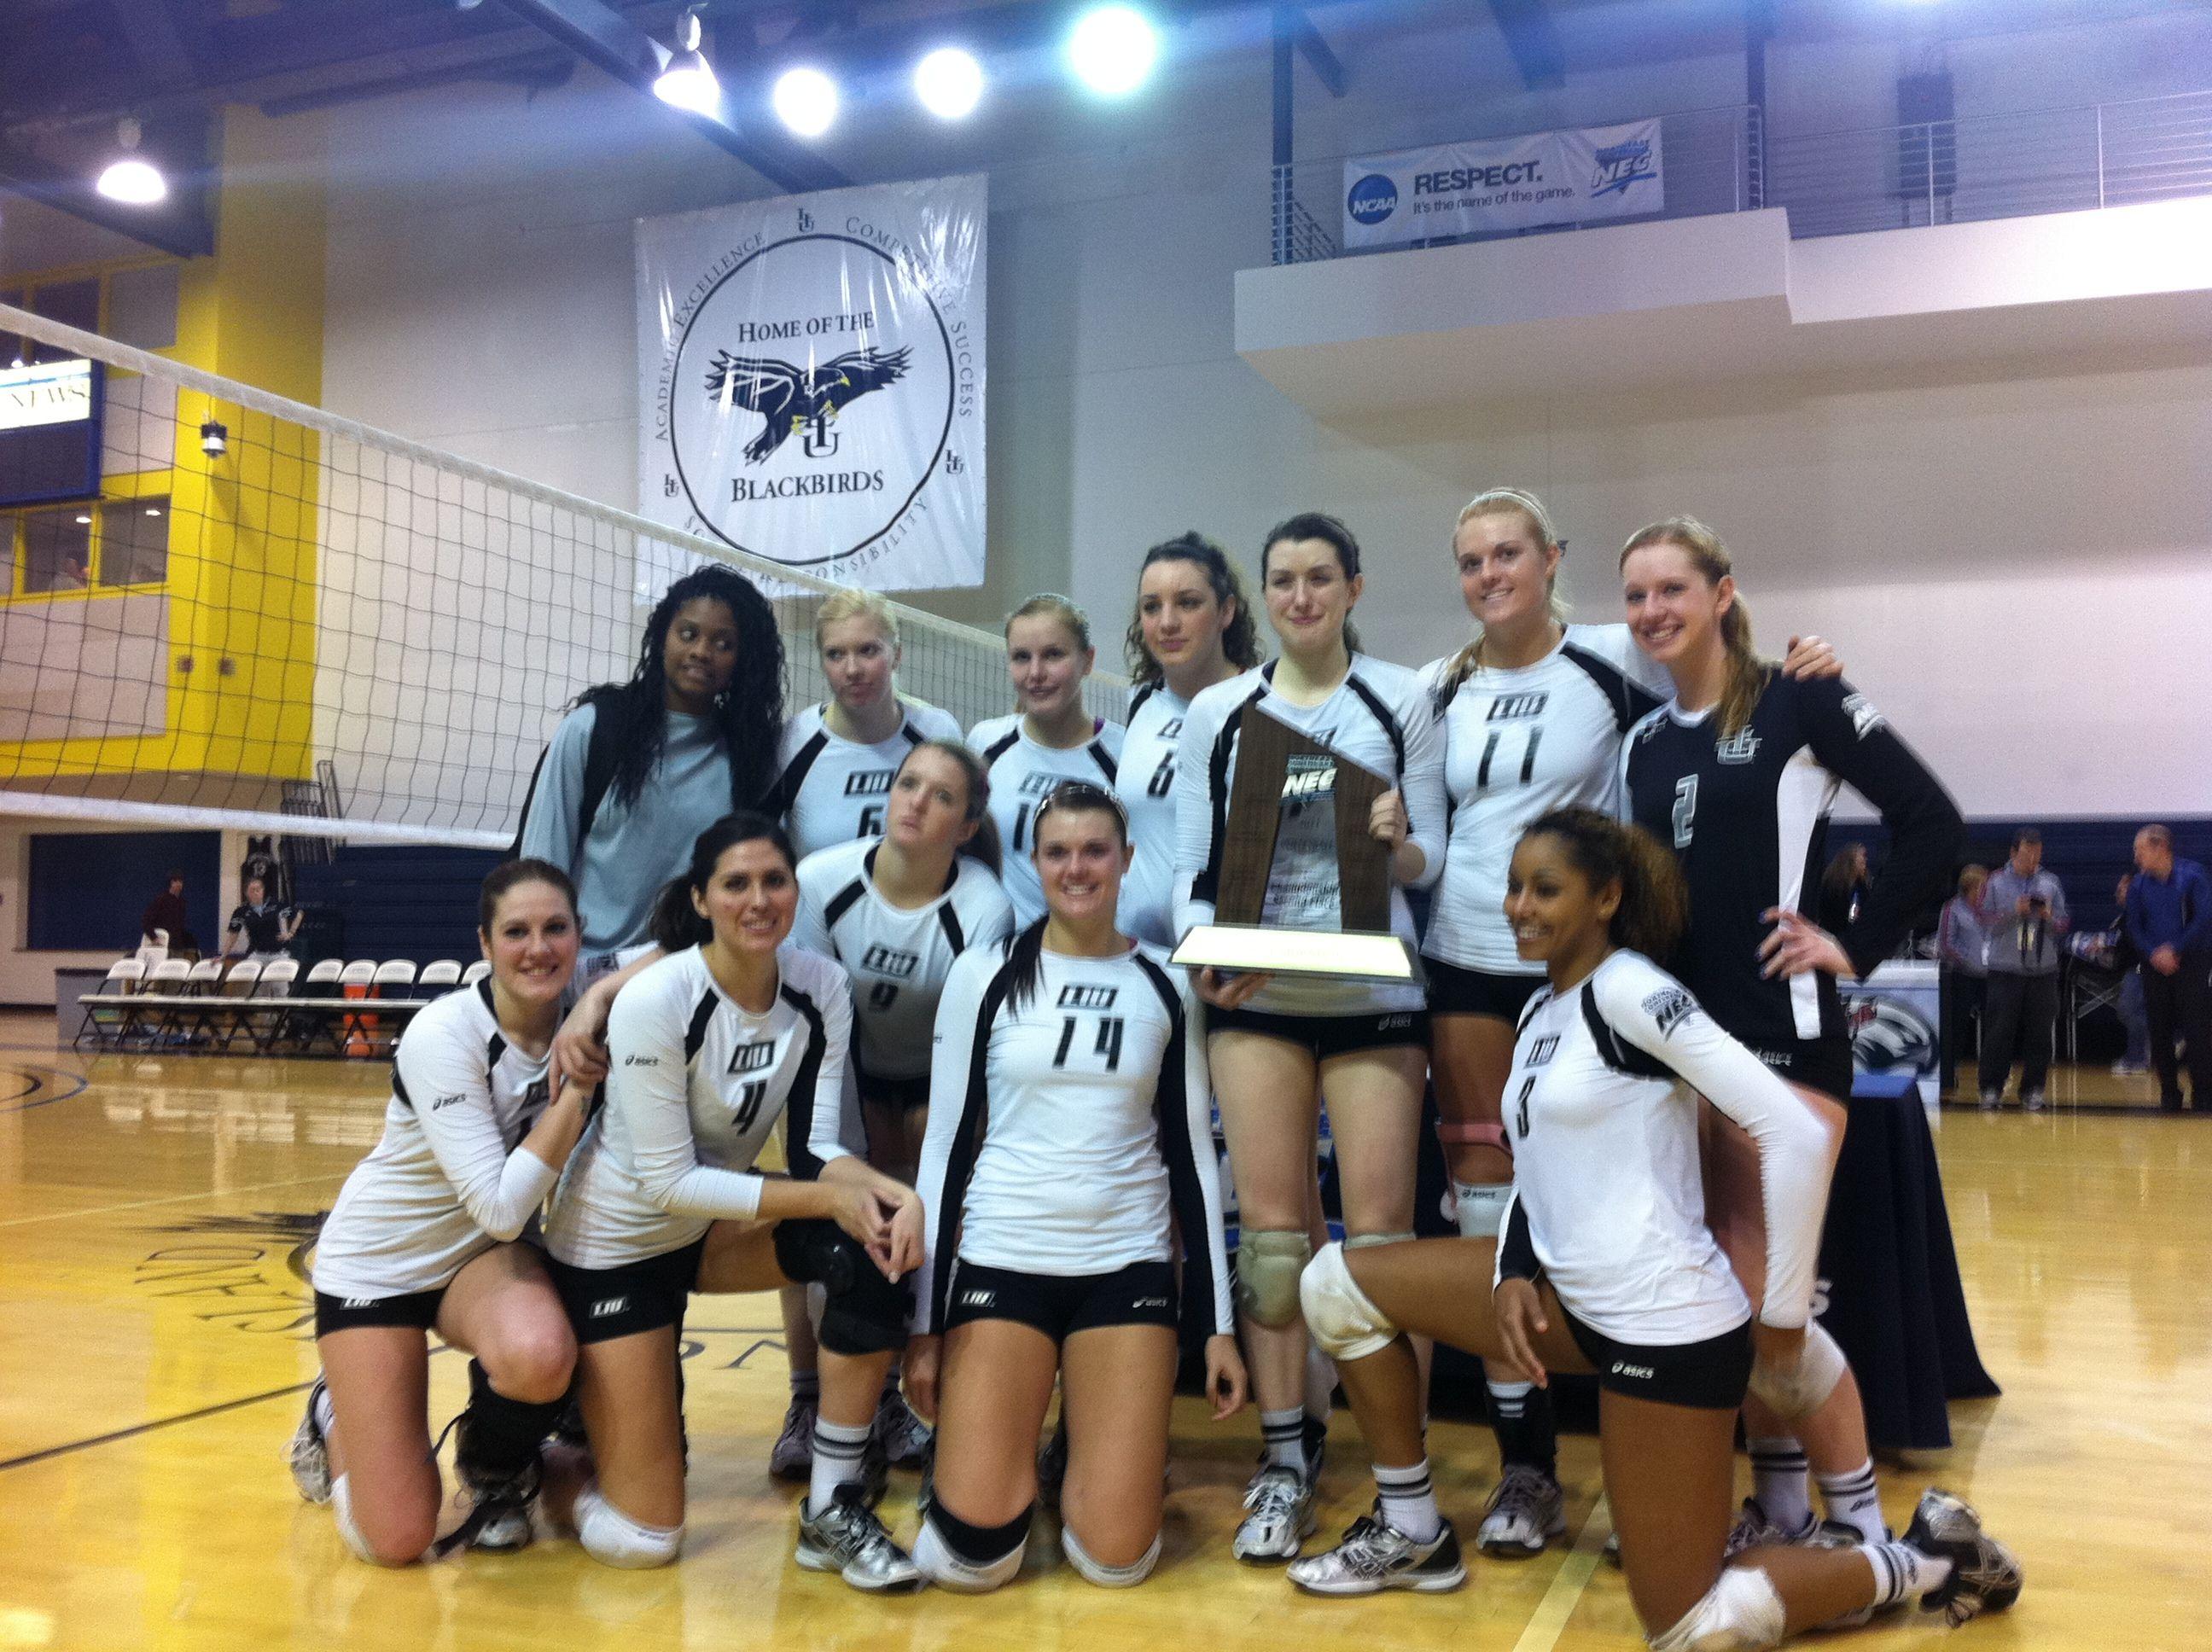 Liu Volleyball Winning Love You Girls Brooklyn Baby Brooklyn Baby Your Girl Nyc